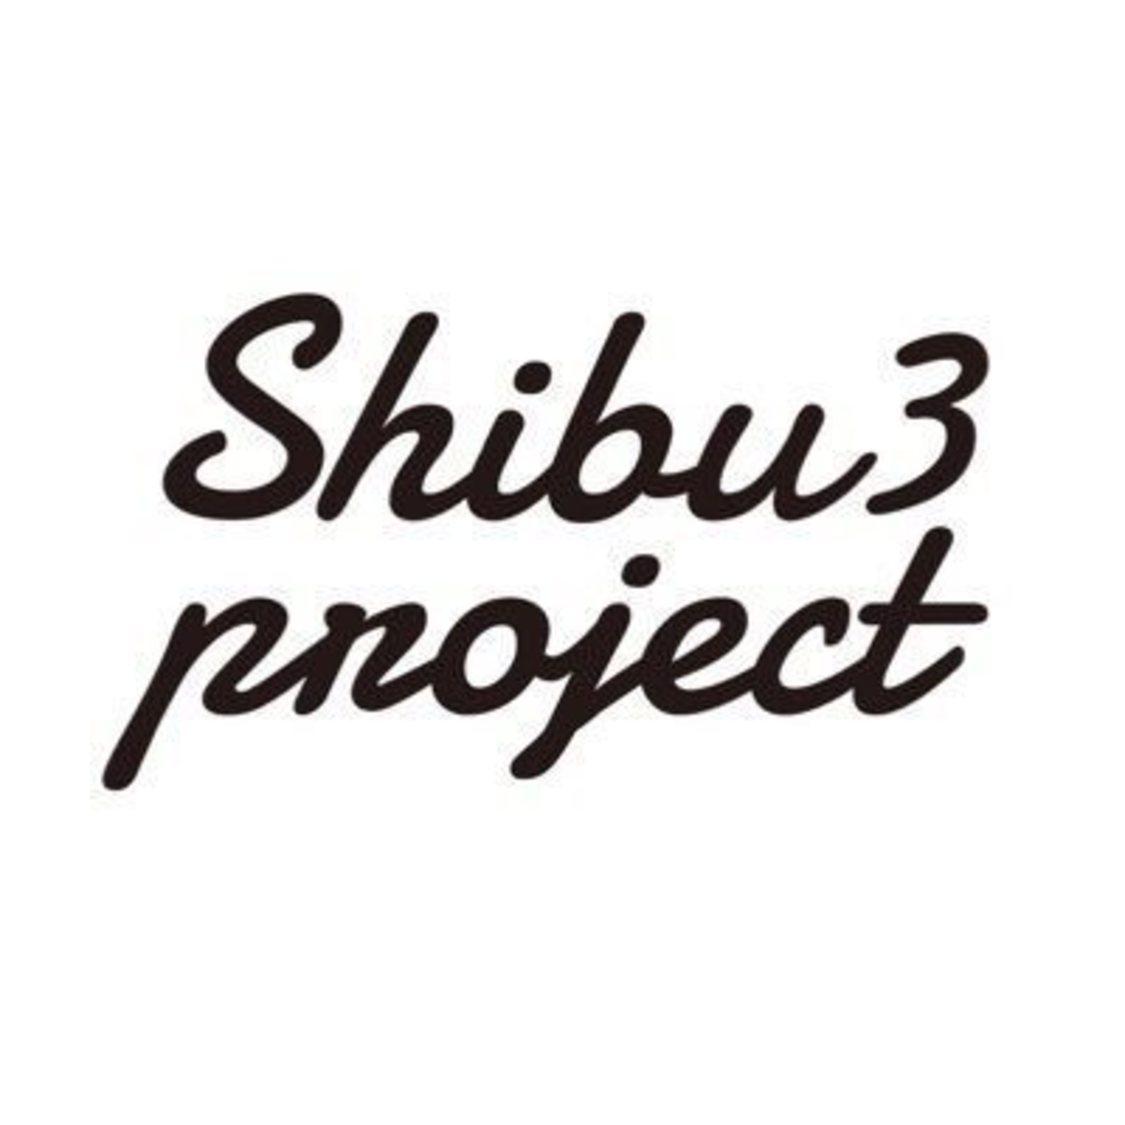 Shibu3 project、総勢50名参加の新SG CDジャケット争奪イベント開催!